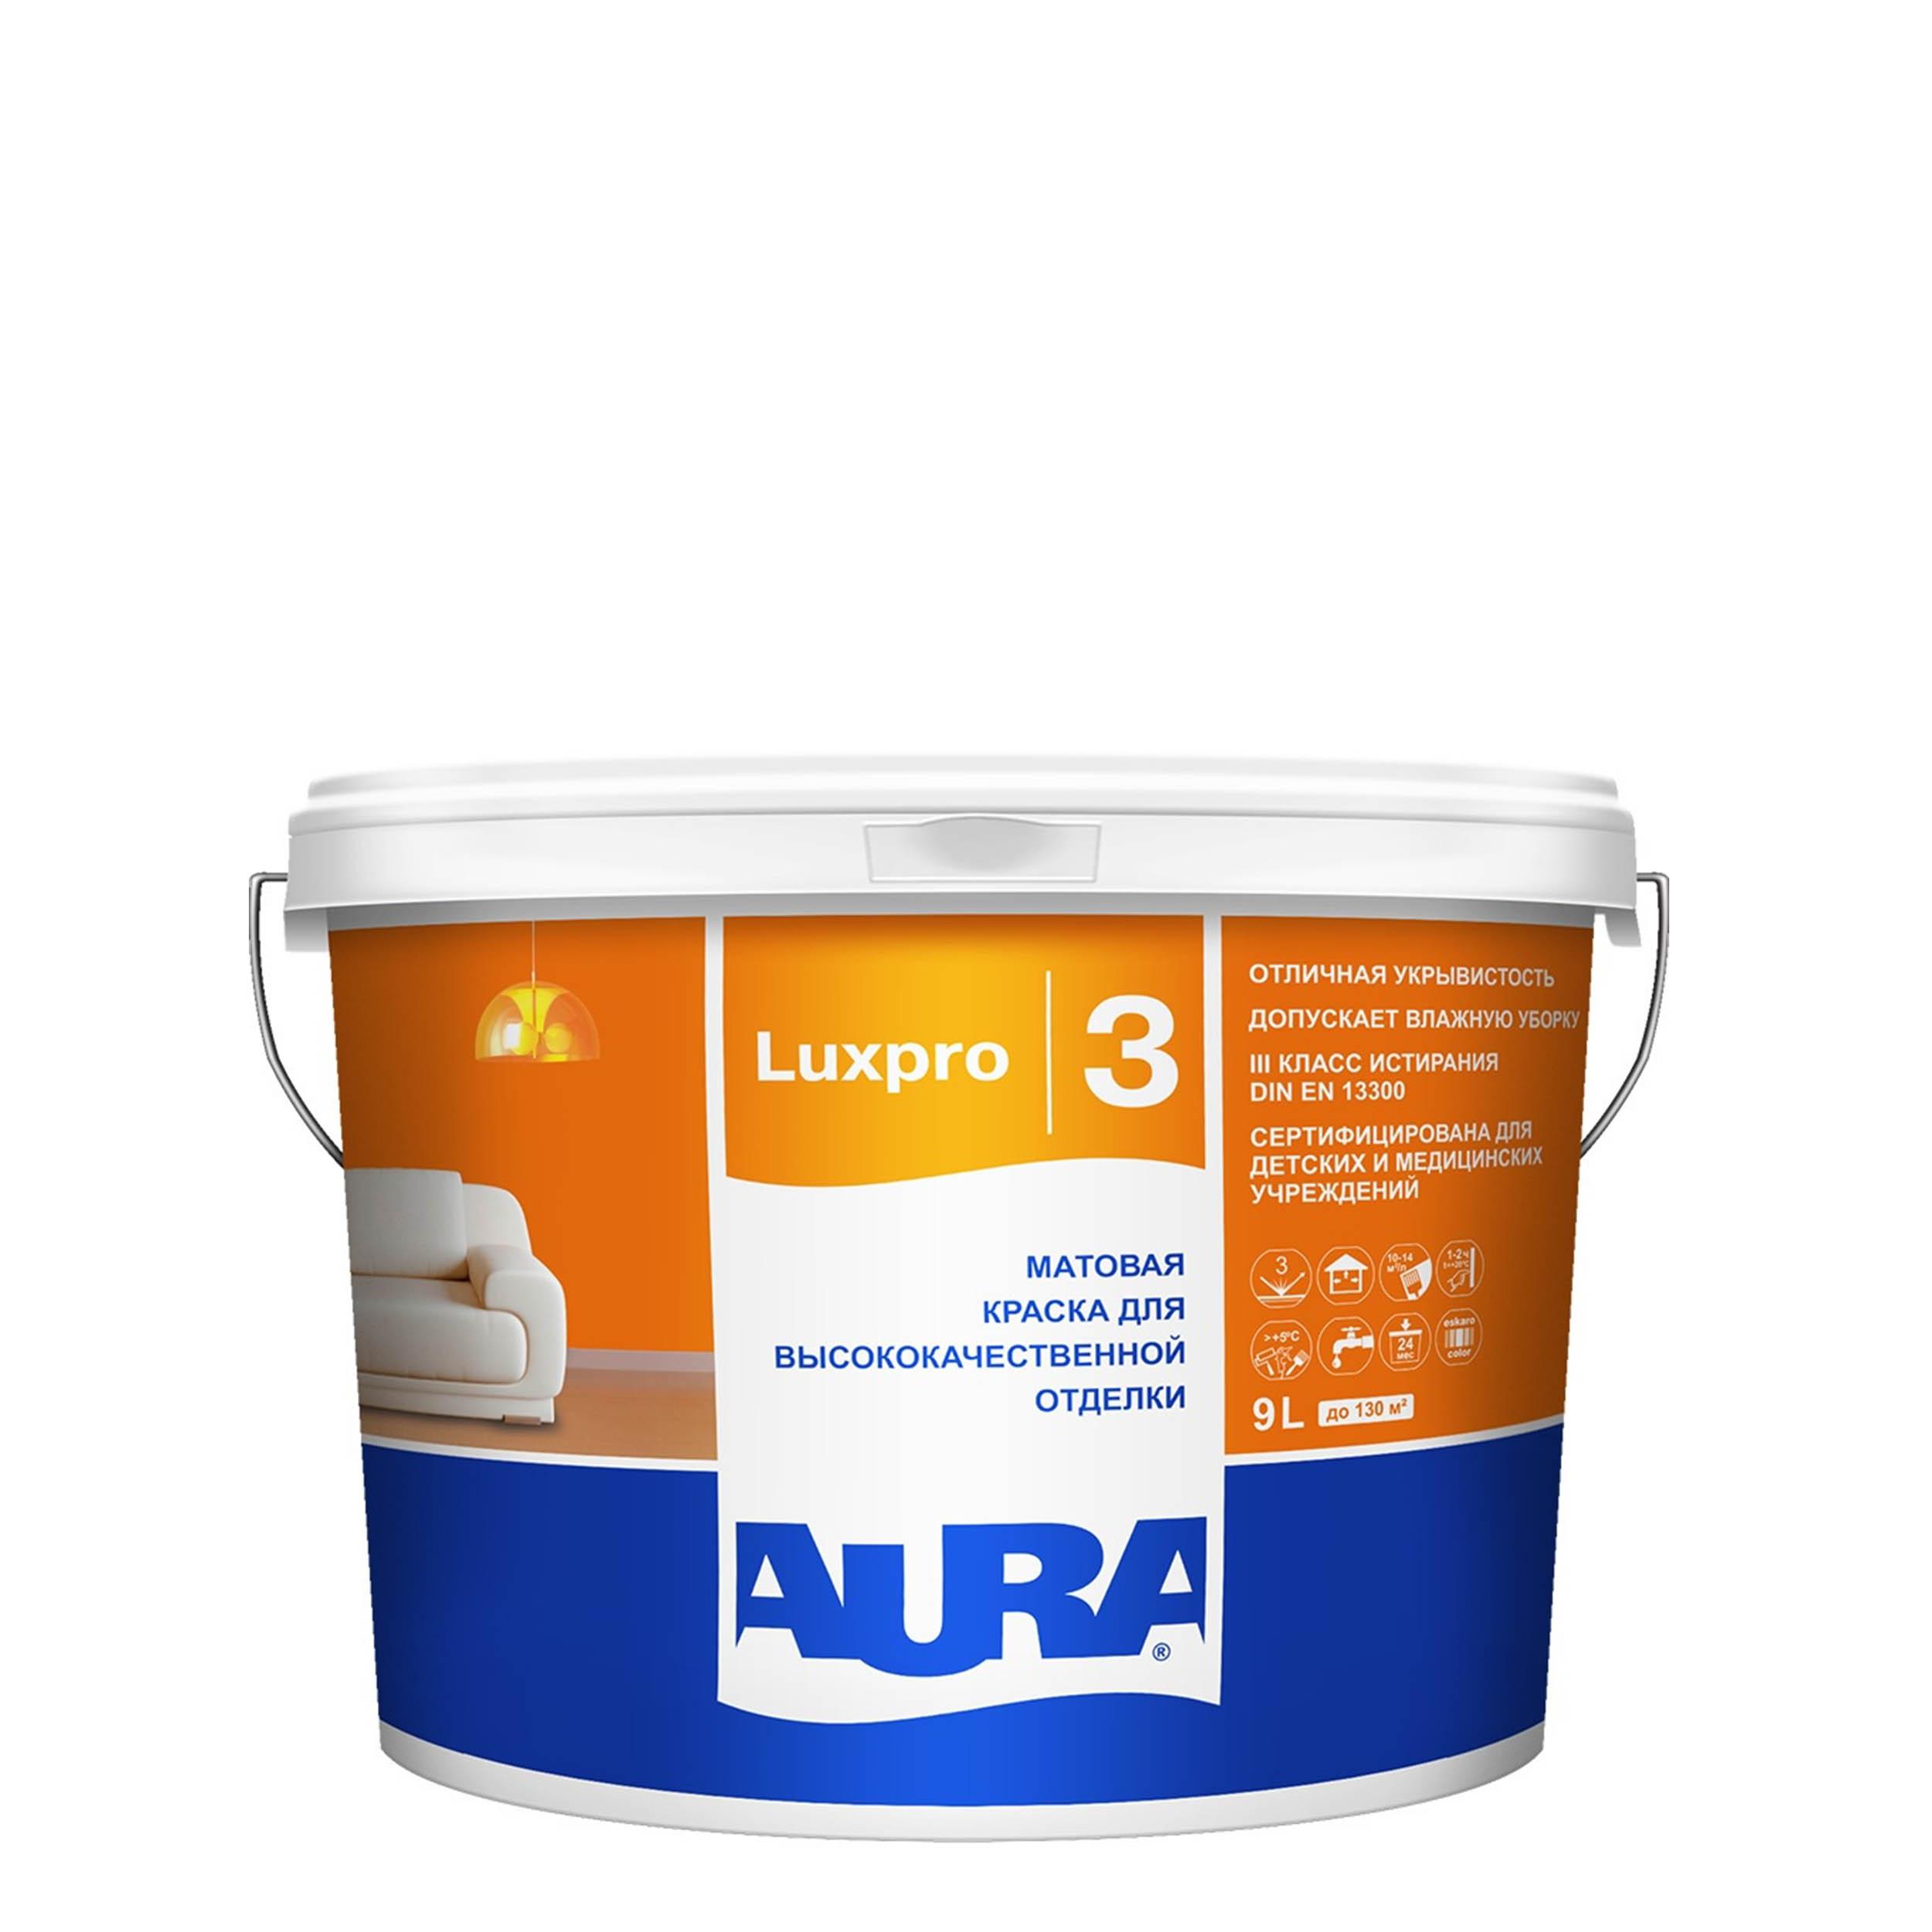 Фото 3 - Краска интерьерная, Aura LuxPRO 3, RAL 6008, 11 кг.